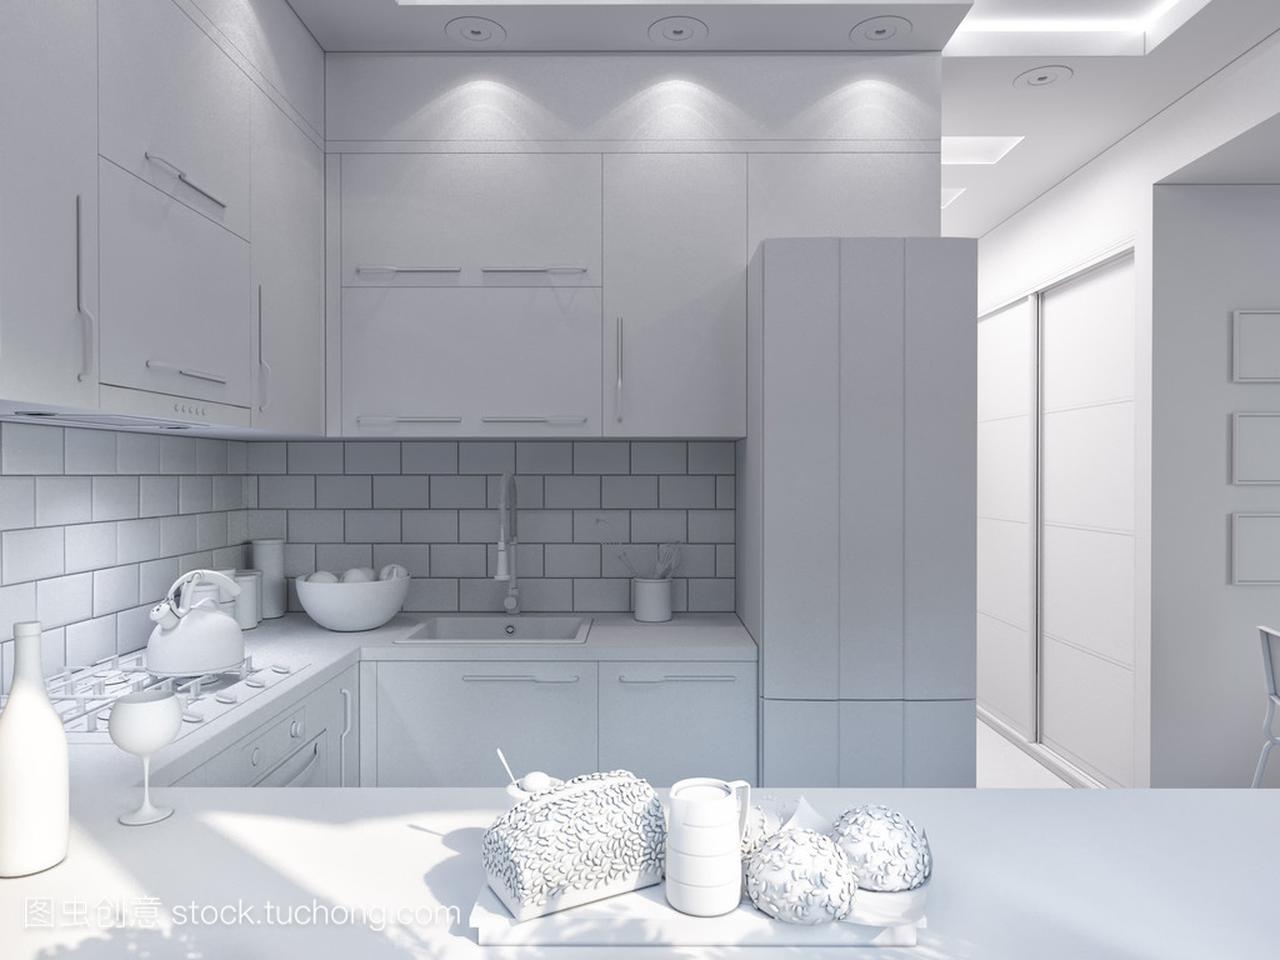 3d渲染的厨房装修。在现代野兽的室内设计风格派建筑设计图片